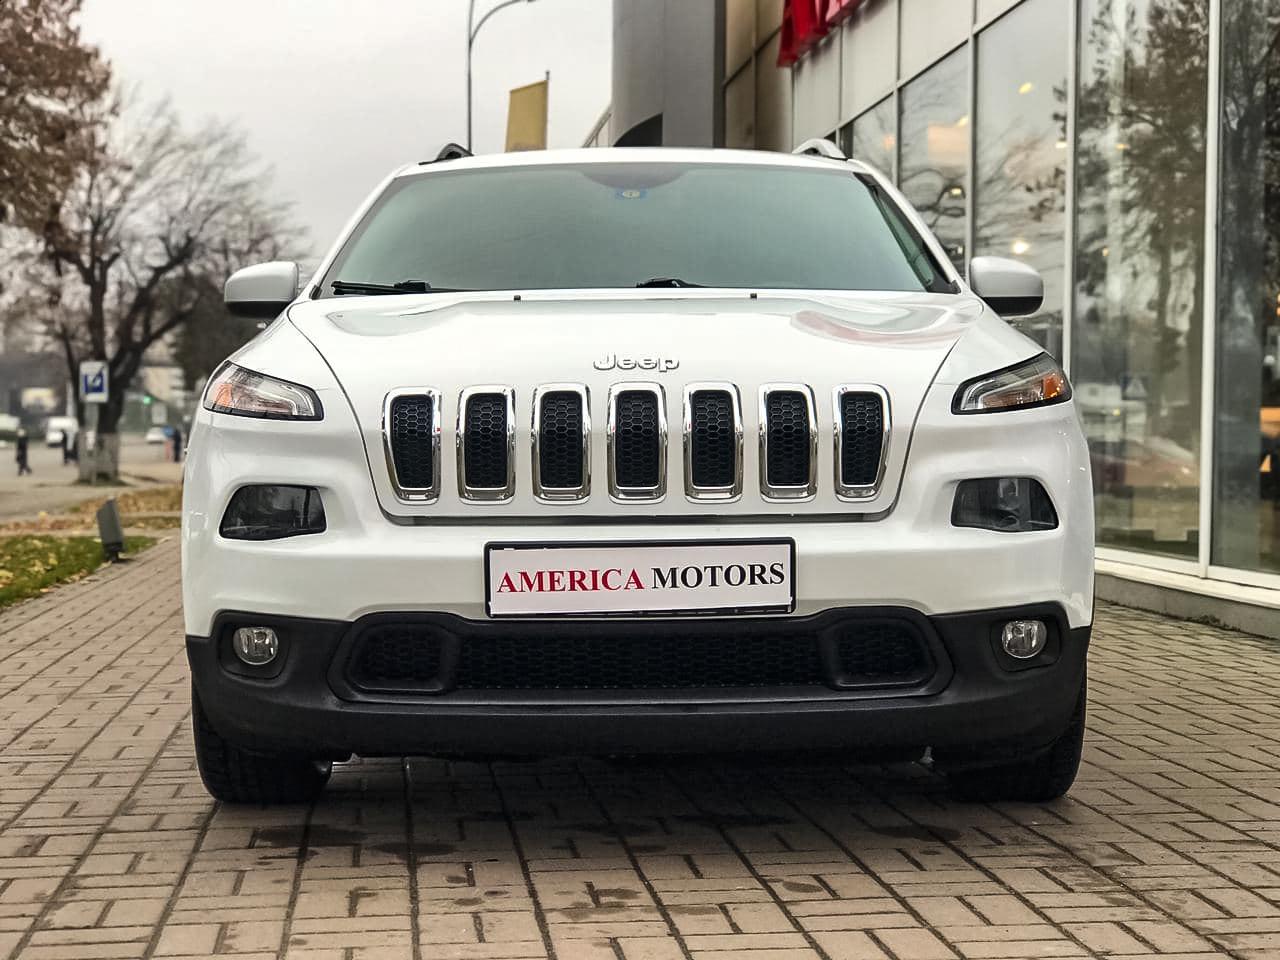 2017 Jeep CHEROKEE | Vin: 1C4PJLLB9JD590641